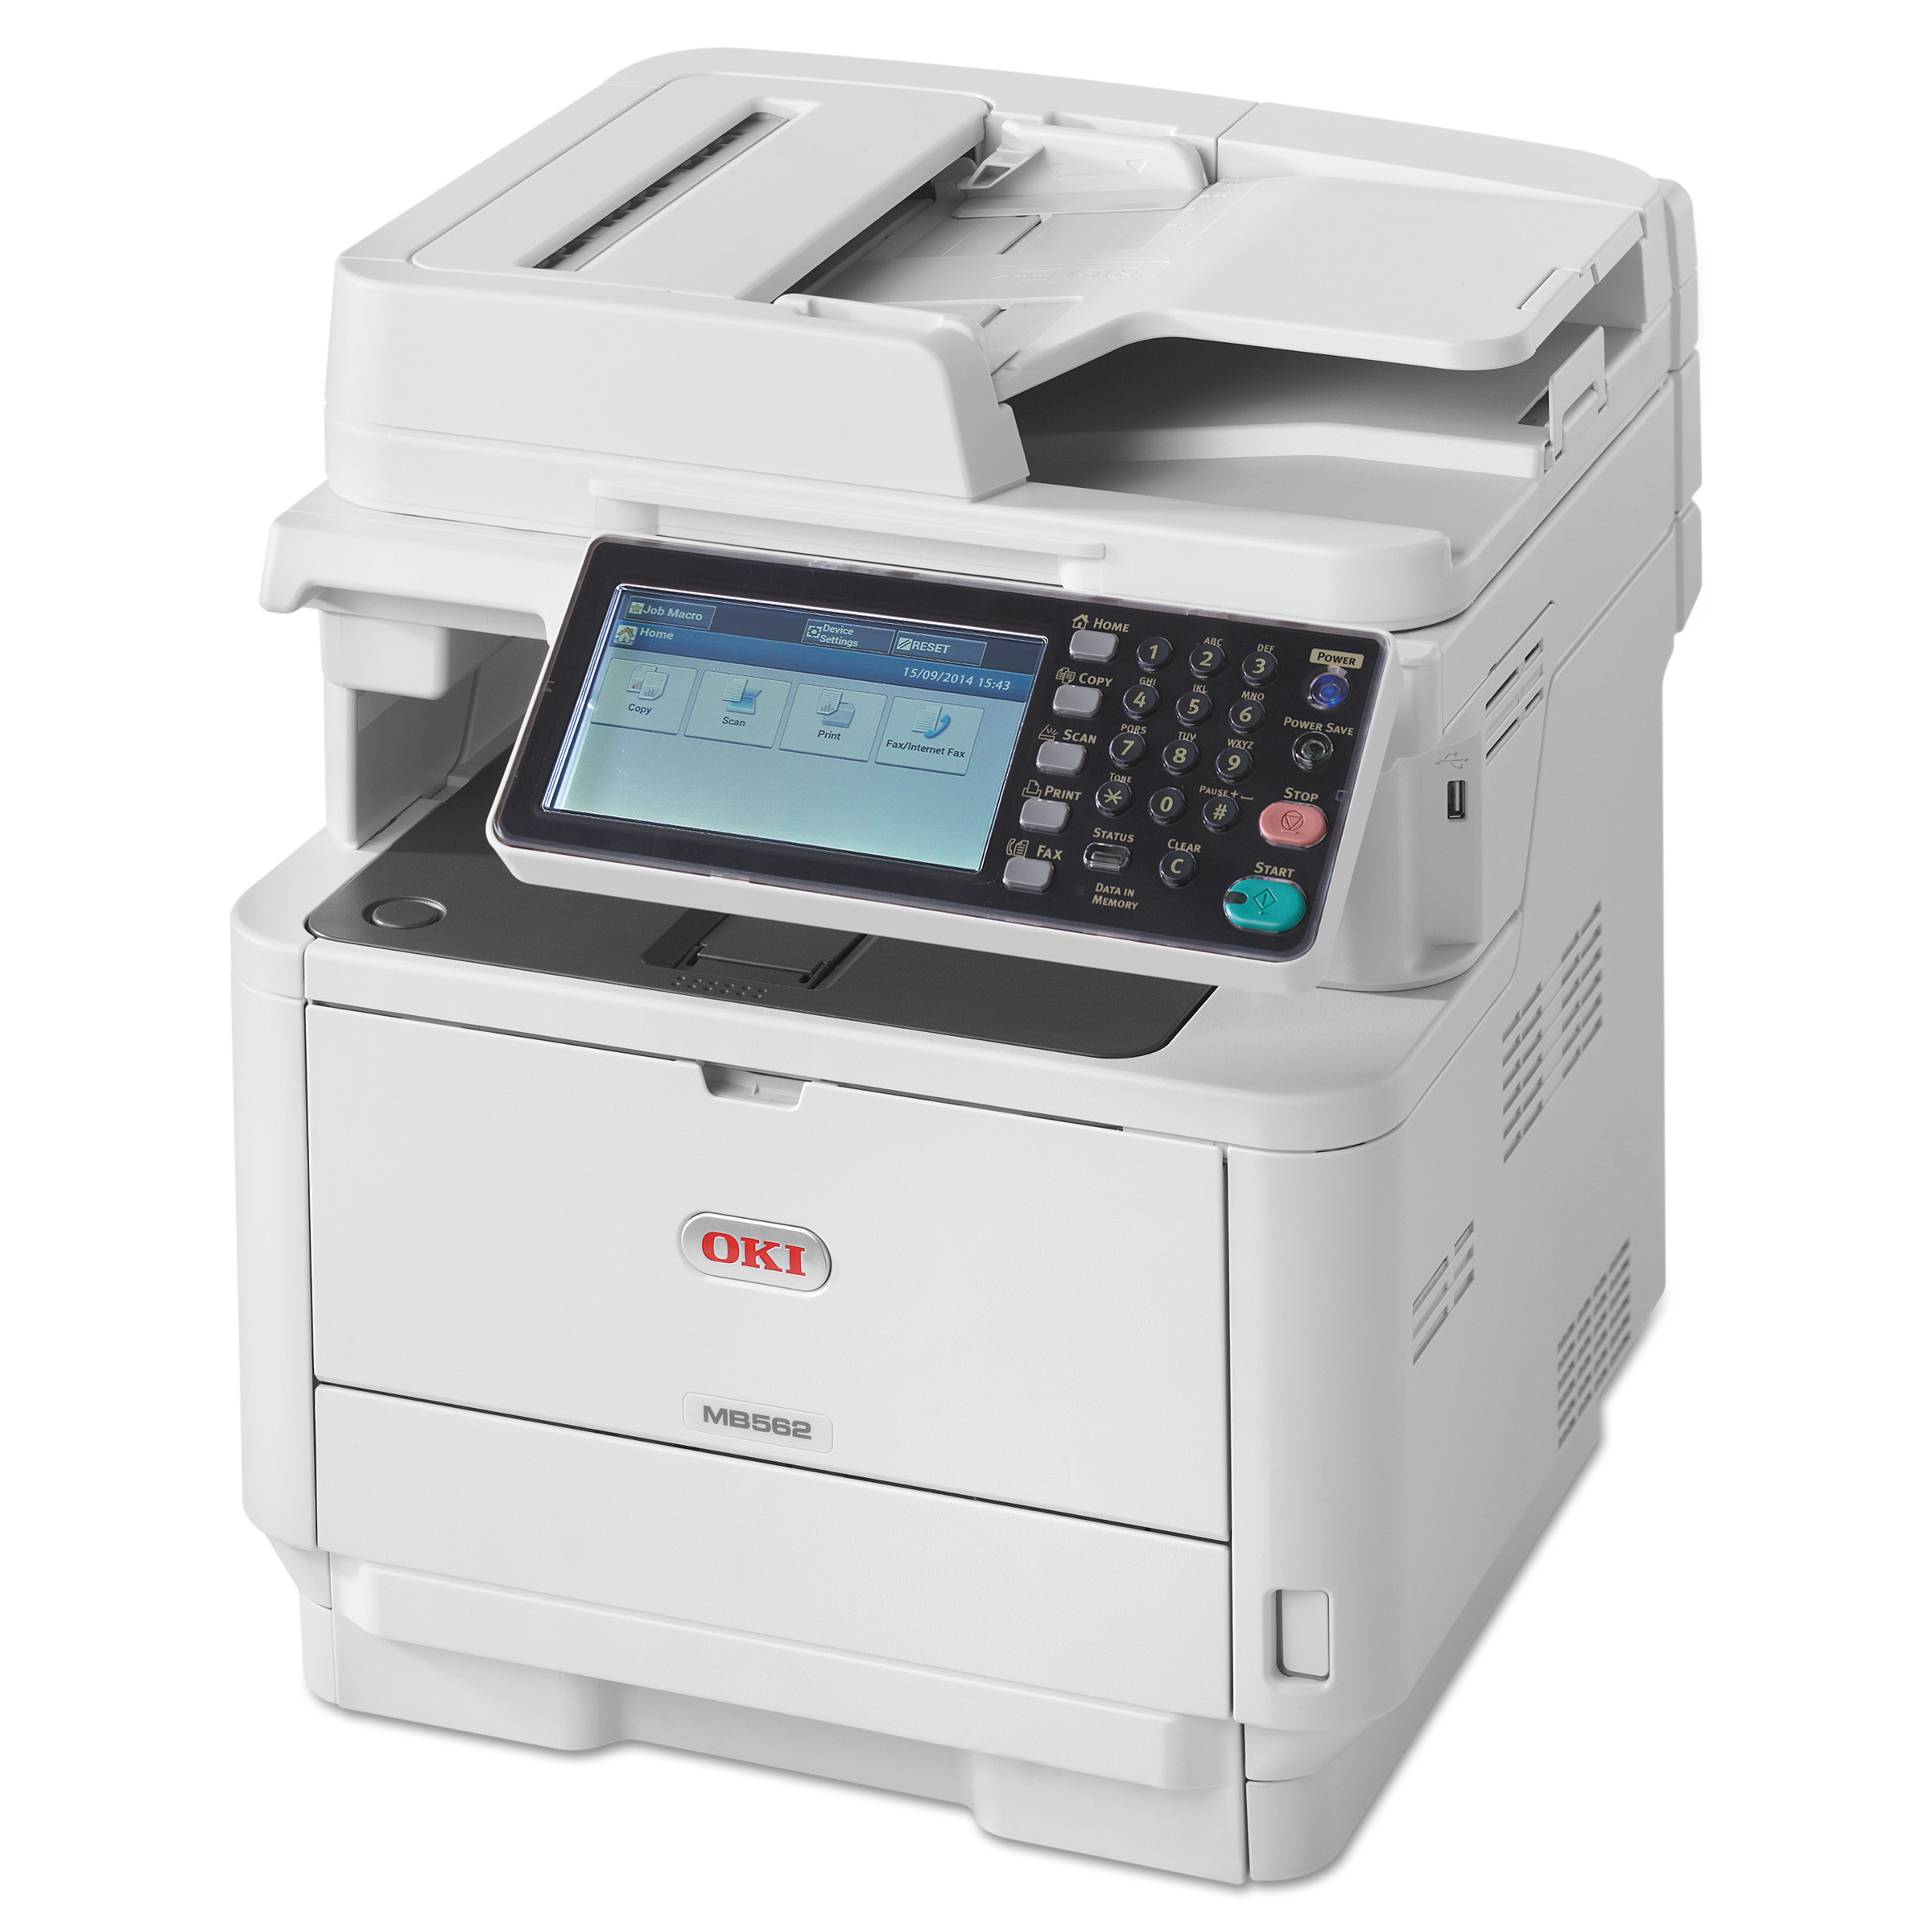 Oki MB562W Monochrome Wireless Multifunction Laser Printer, Copy/Fax/Print/Scan